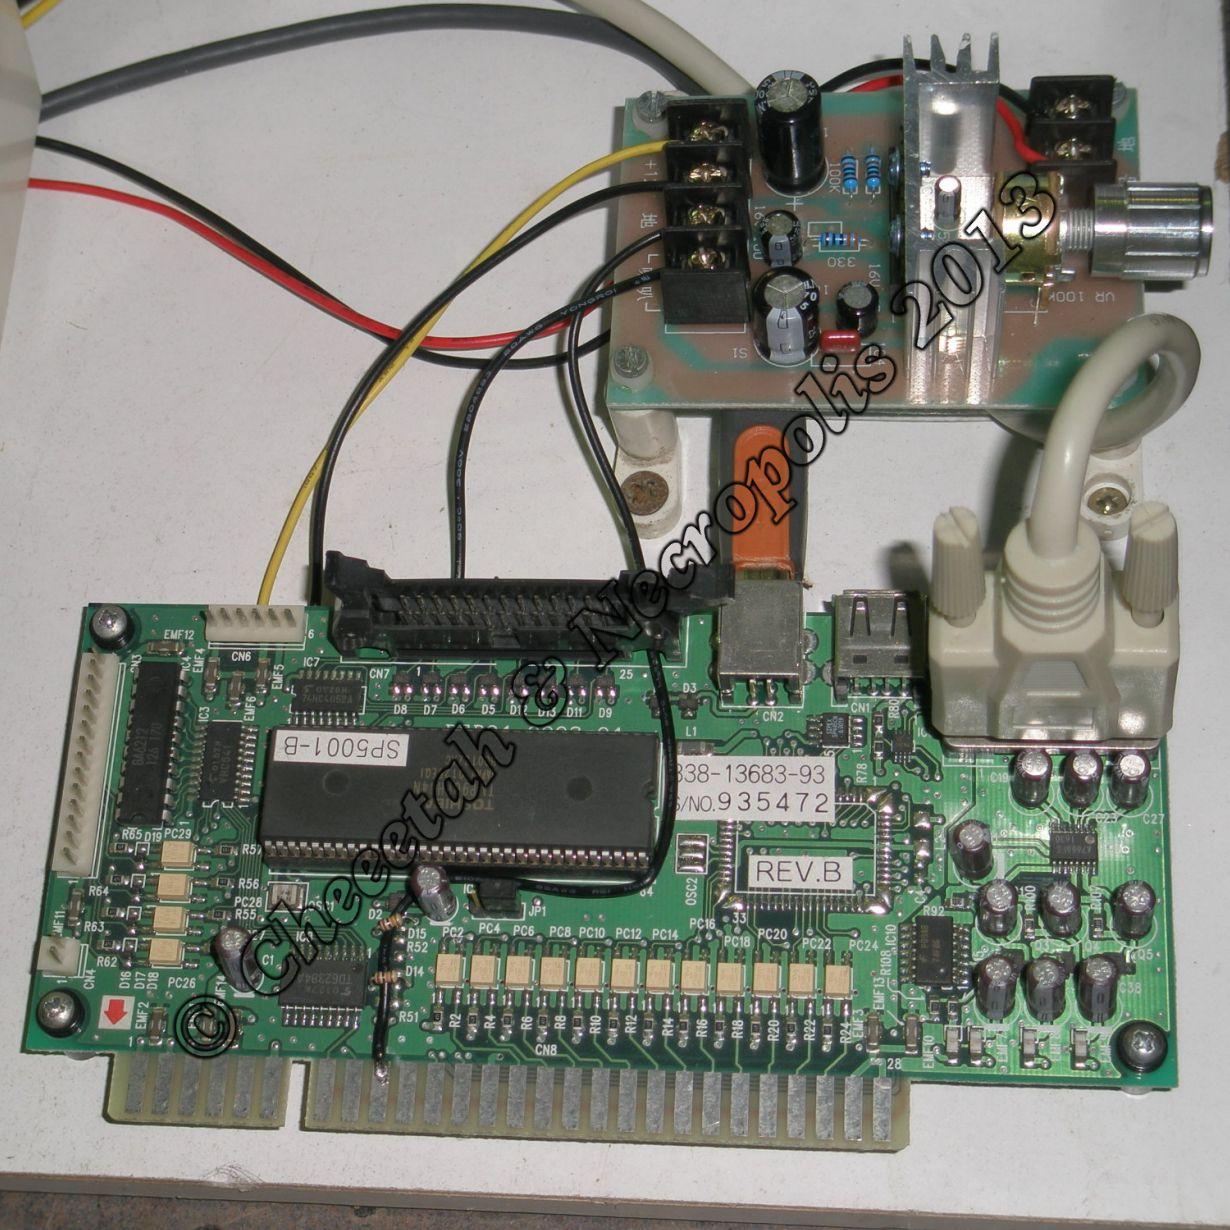 http://arcadius.esero.net/Arcade/Games/Systems_Only/Sega_Naomi/Naomi_Jamma_setup_B_04.jpg